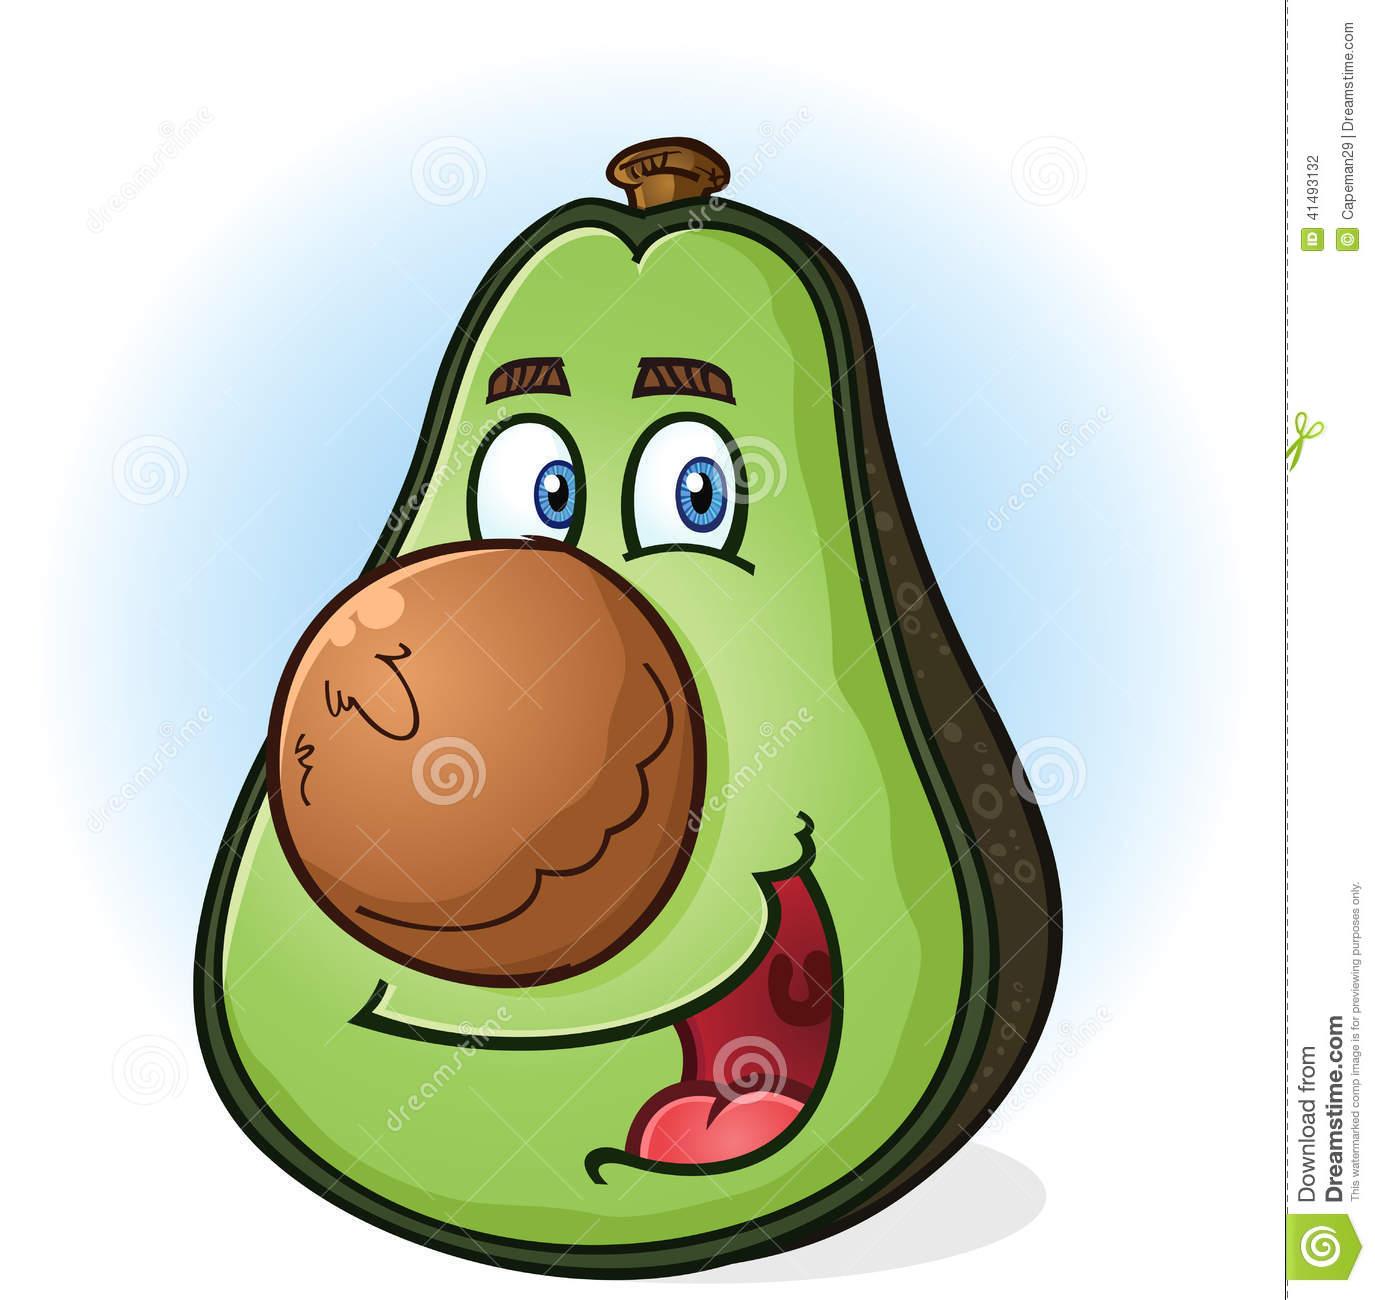 91 Avocado free clipart.